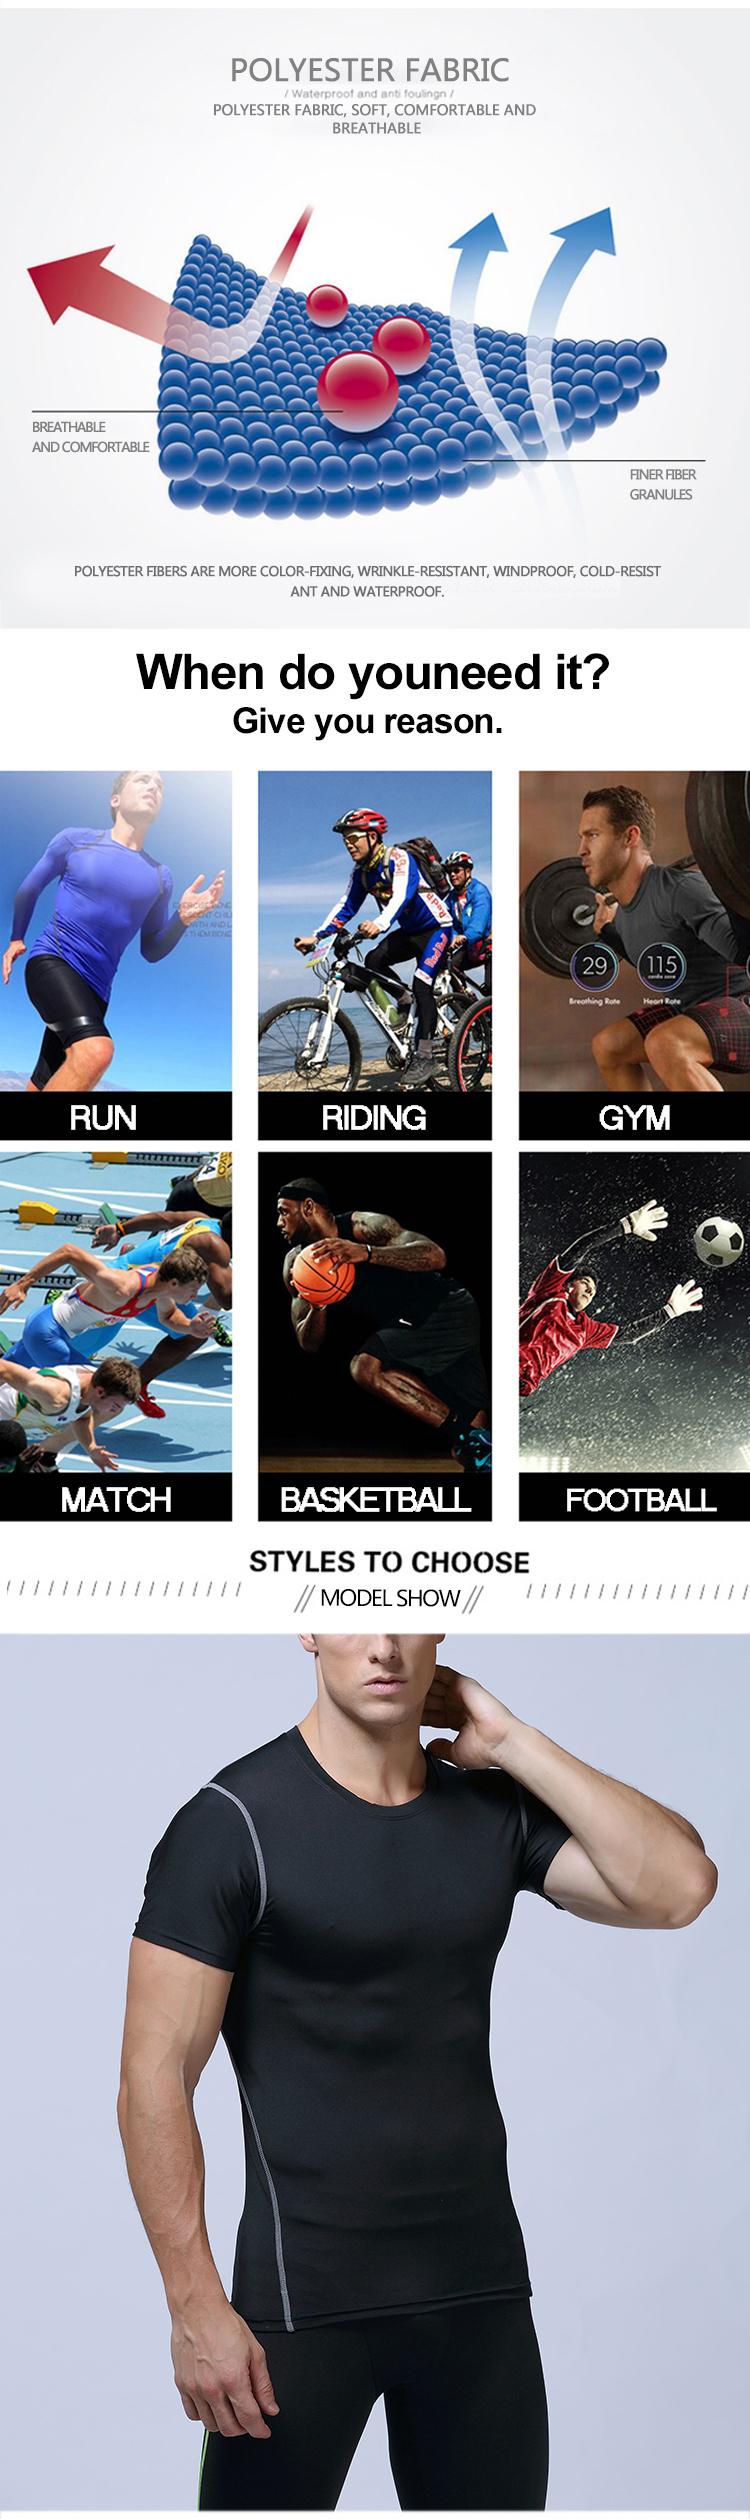 Kustom LOGO Pria Olahraga T Kemeja Pria Kulit Ketat Pakaian Olahraga Pria Pakaian Olahraga Desain Fashion